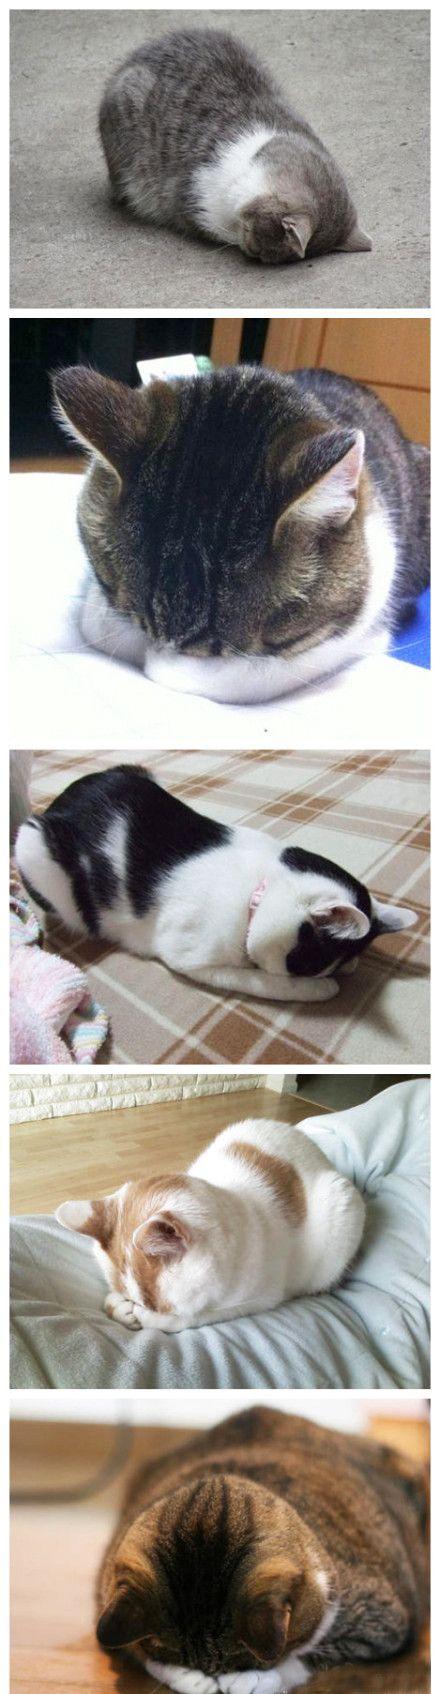 I love when kitties sleep on their faces!